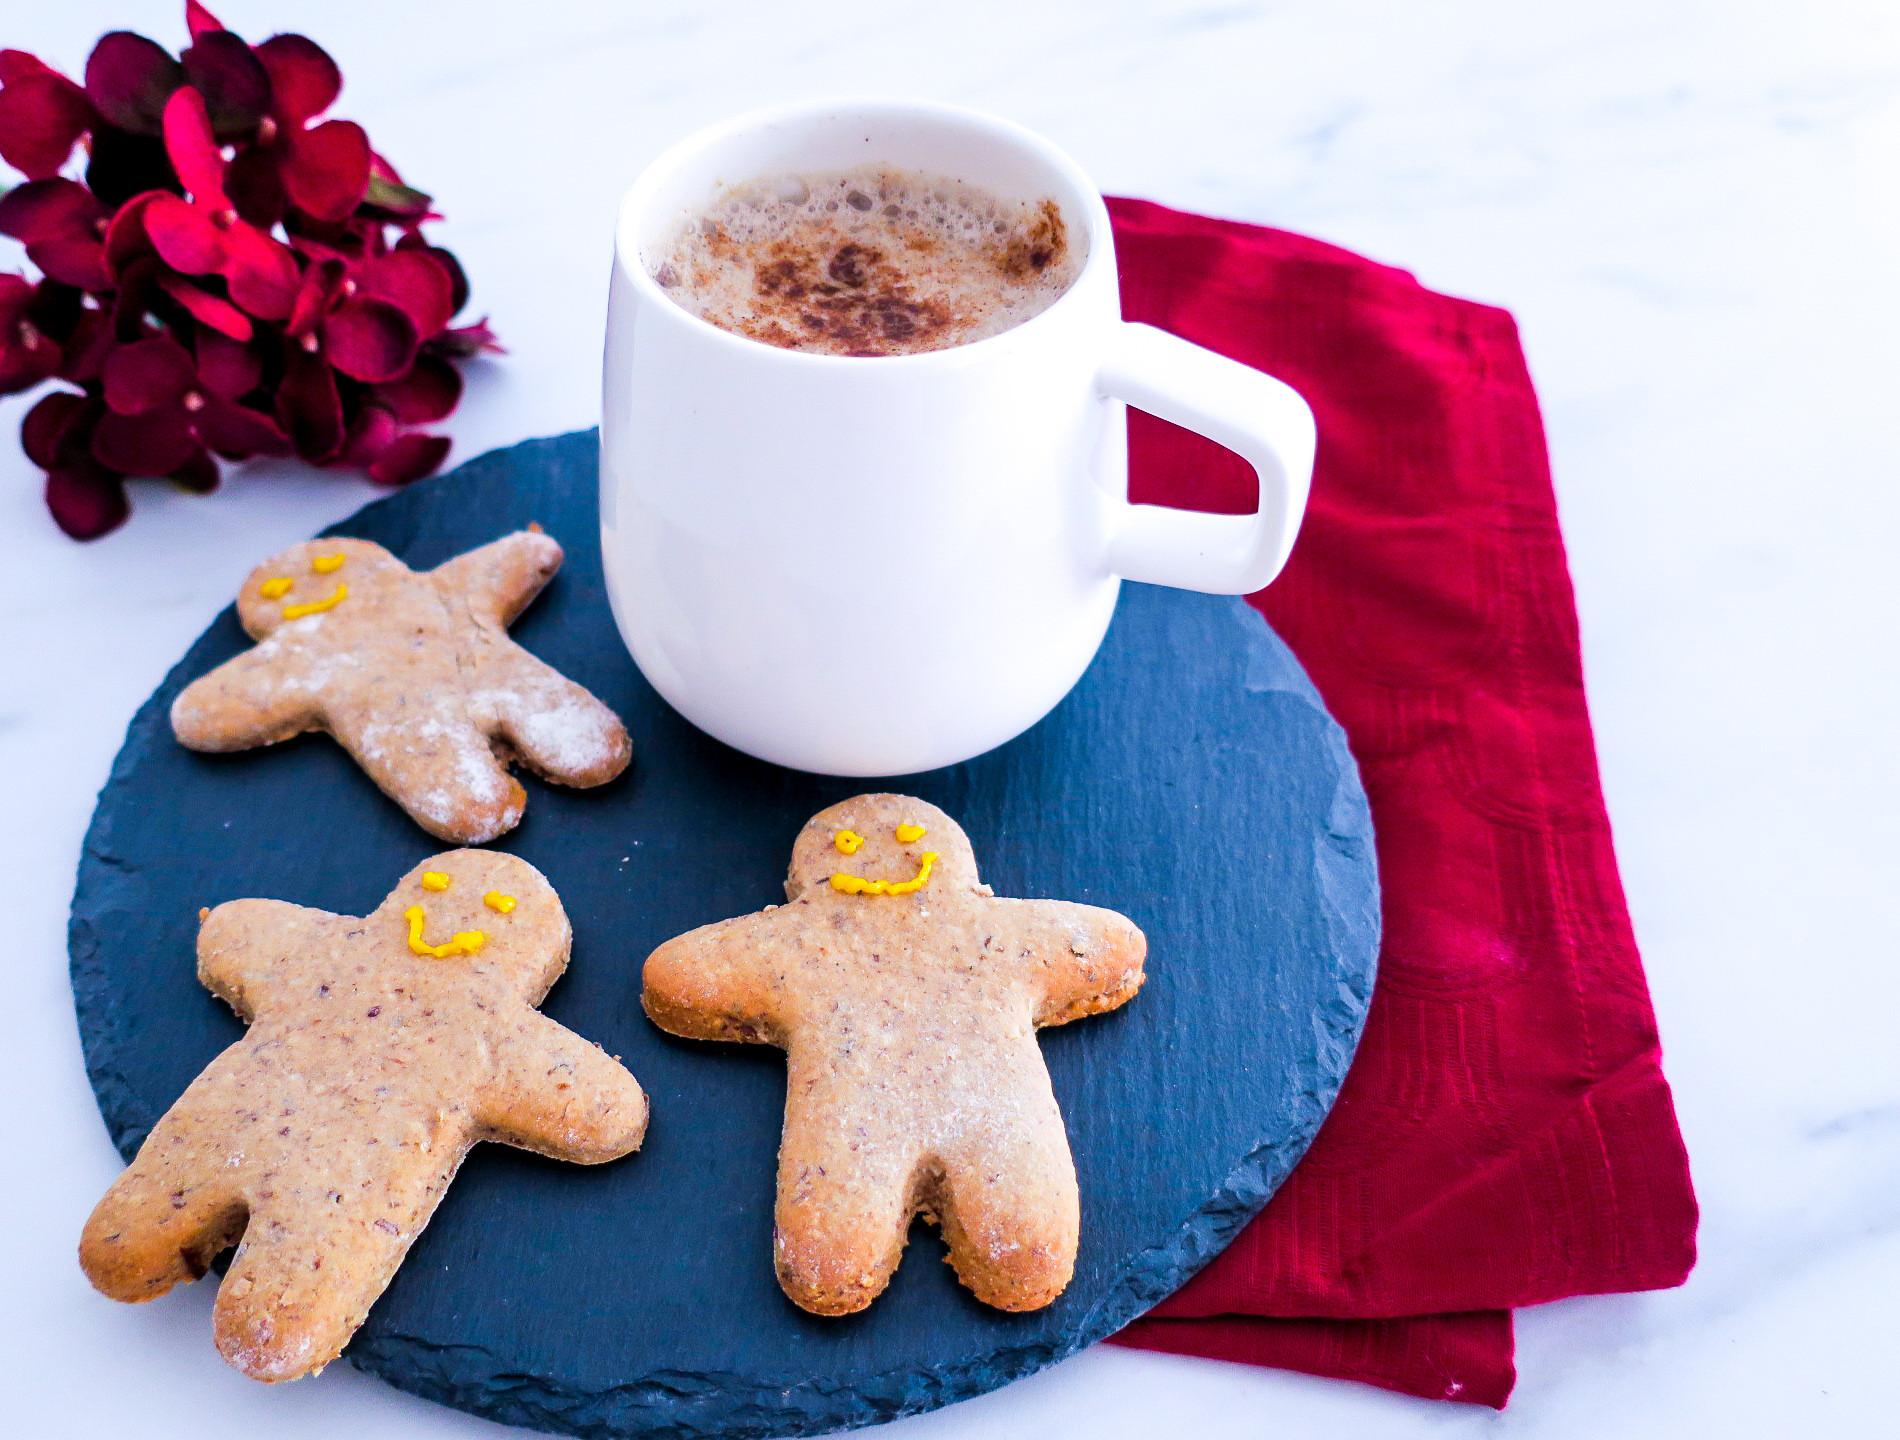 Vegane Spekulatius Chocolate Latte #vegan #healthy #recipe #christmas #spekulatius #chocolate #latte #plantbased #gesund #einfach #lifestyle